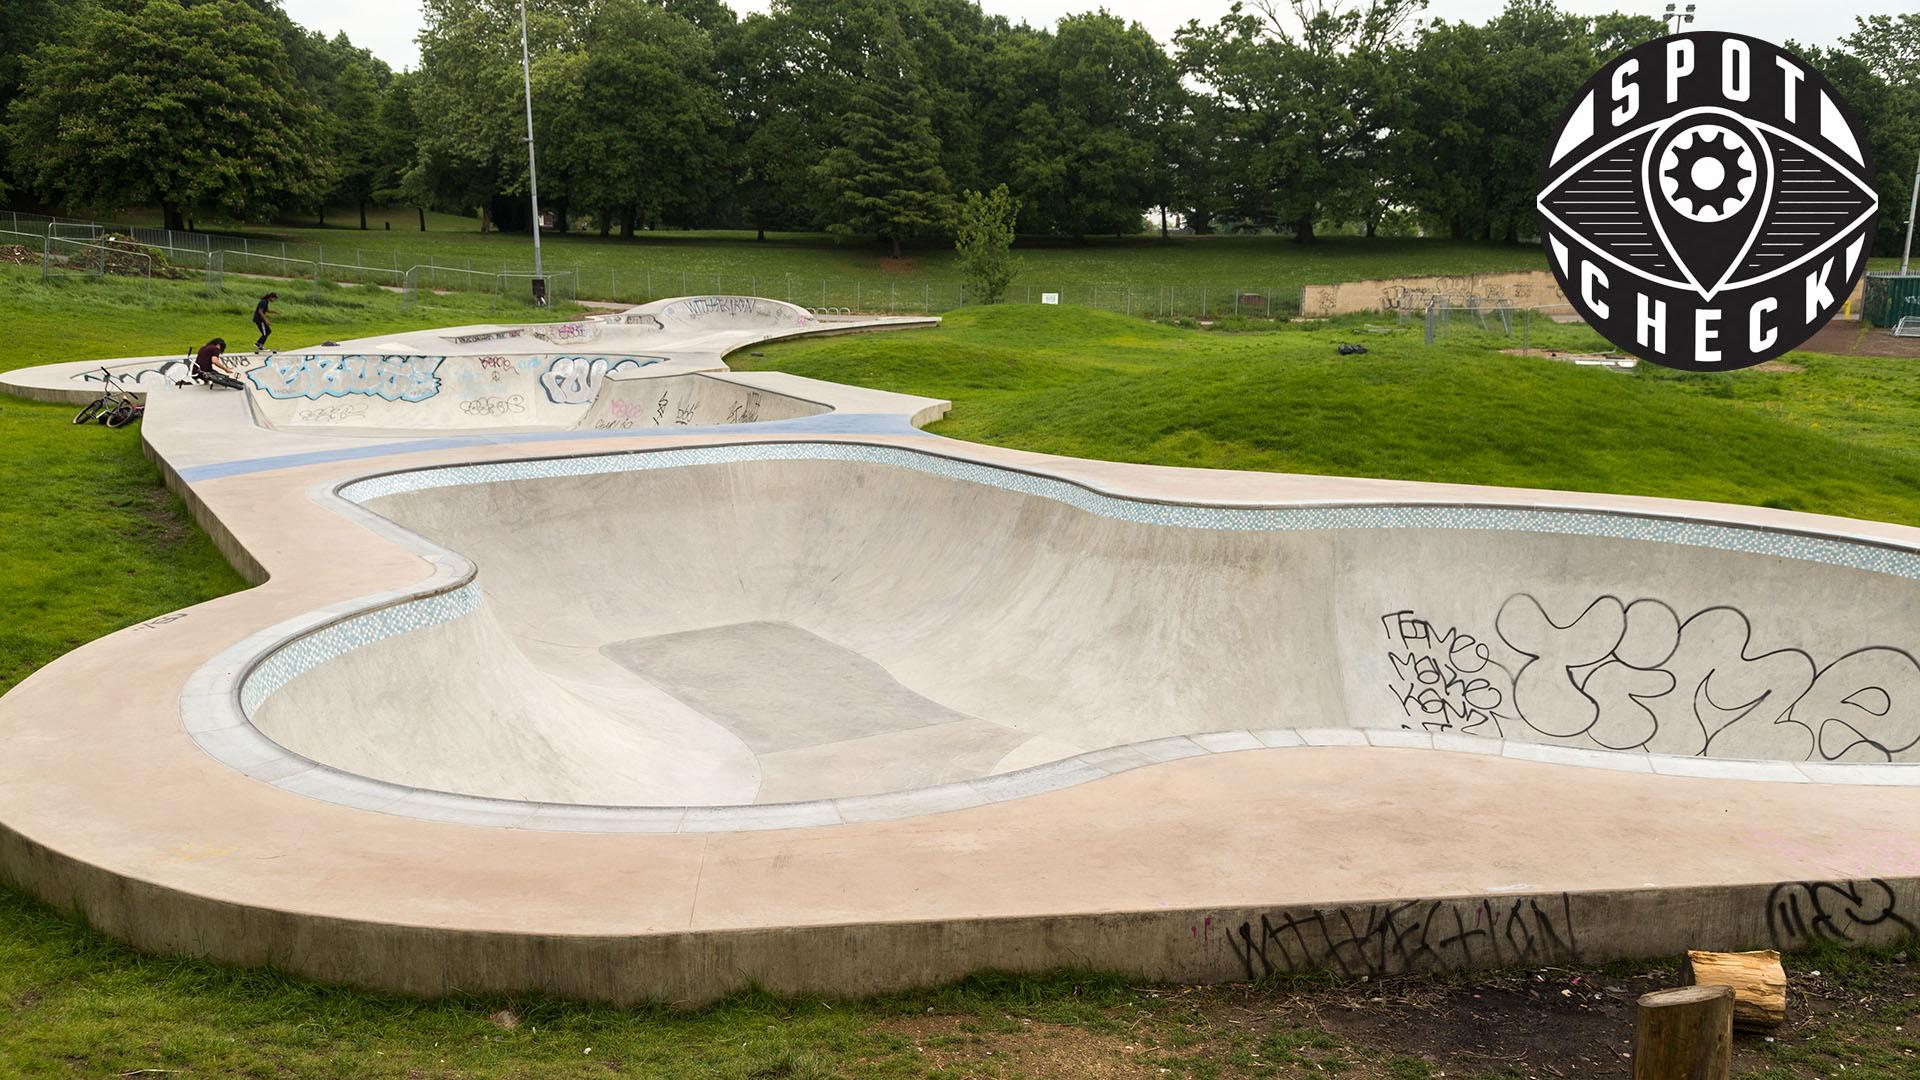 SPOT CHECK: Crystal Palace Skatepark